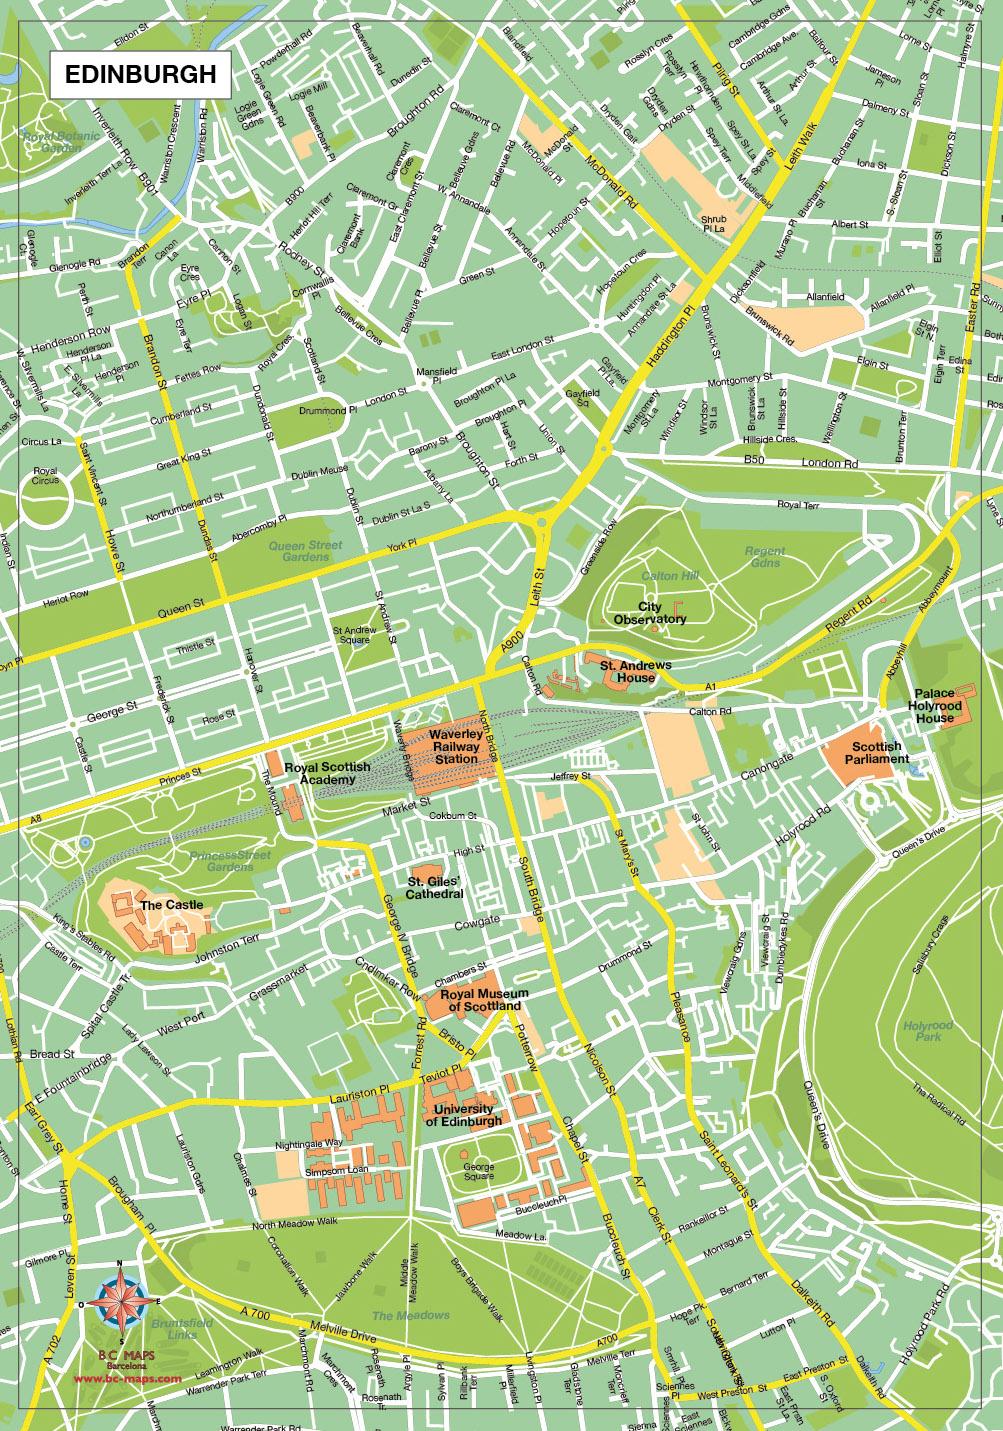 Edinburgh plan de ville fond de carte vectoriel illustrator eps